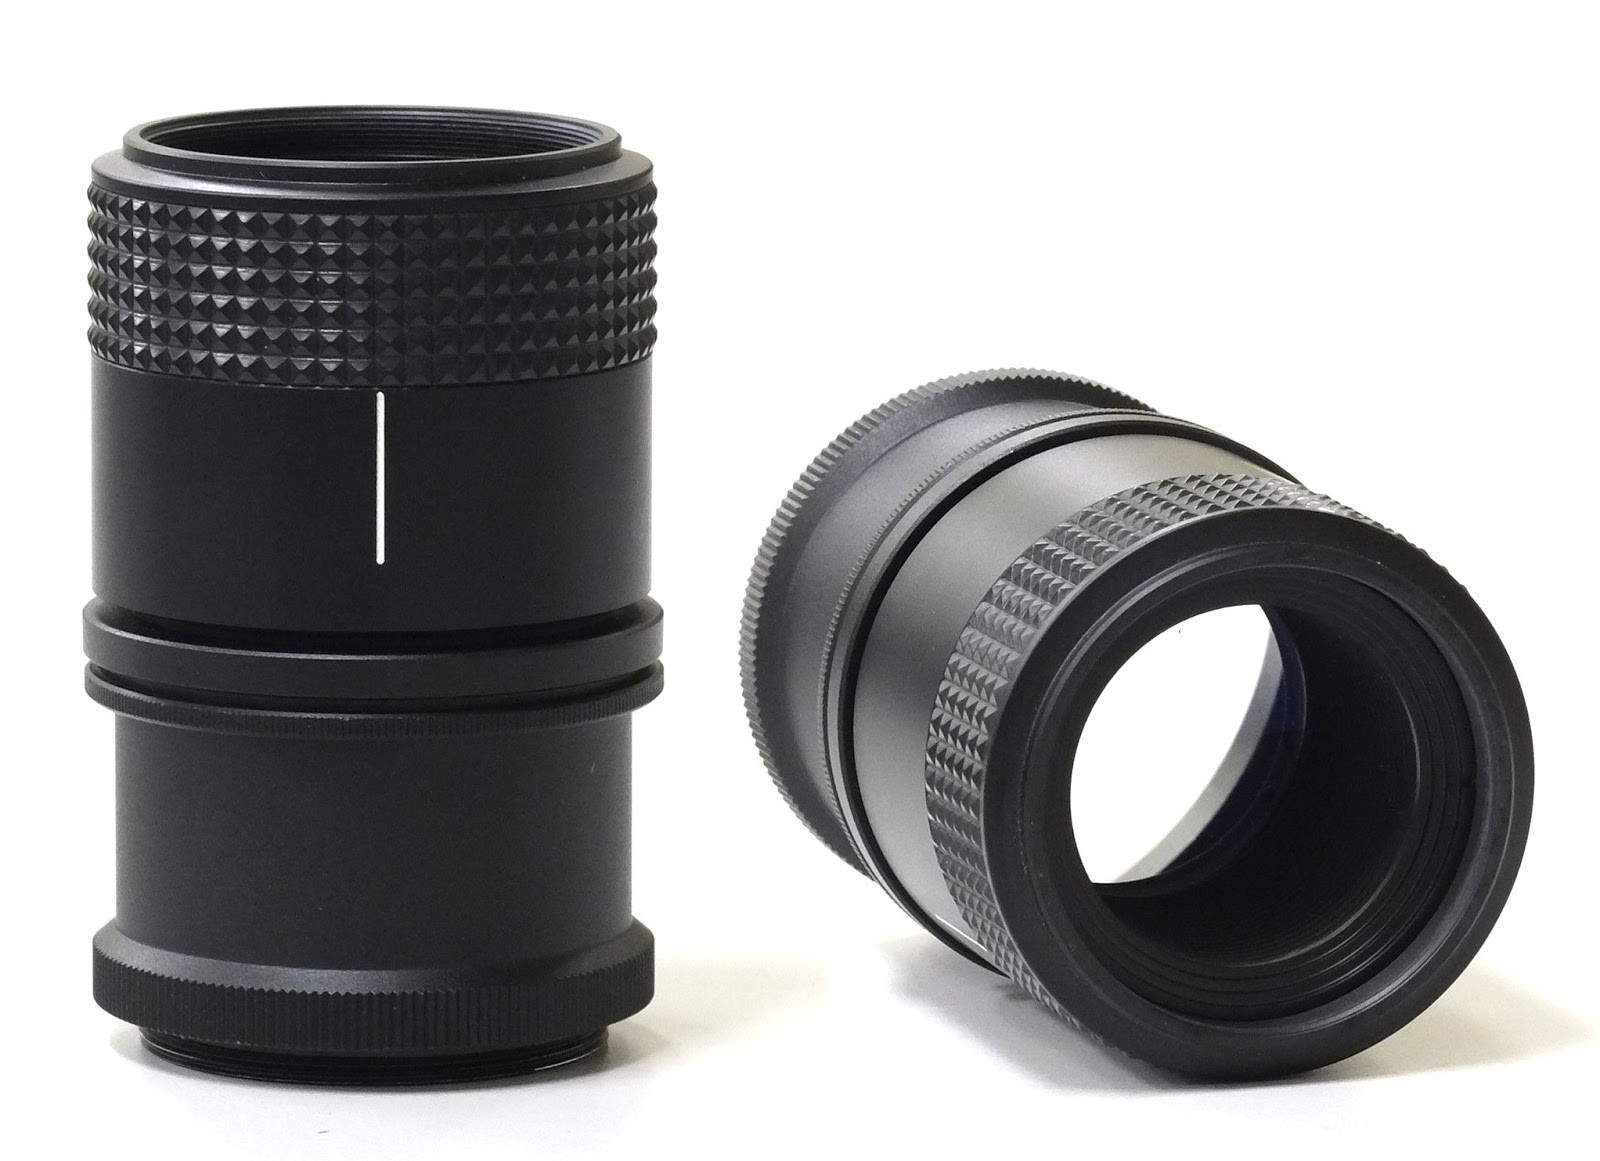 Spiral-733(用于温度计MINOLTA IR630的镜头)转换为M42卡口,镜头样片